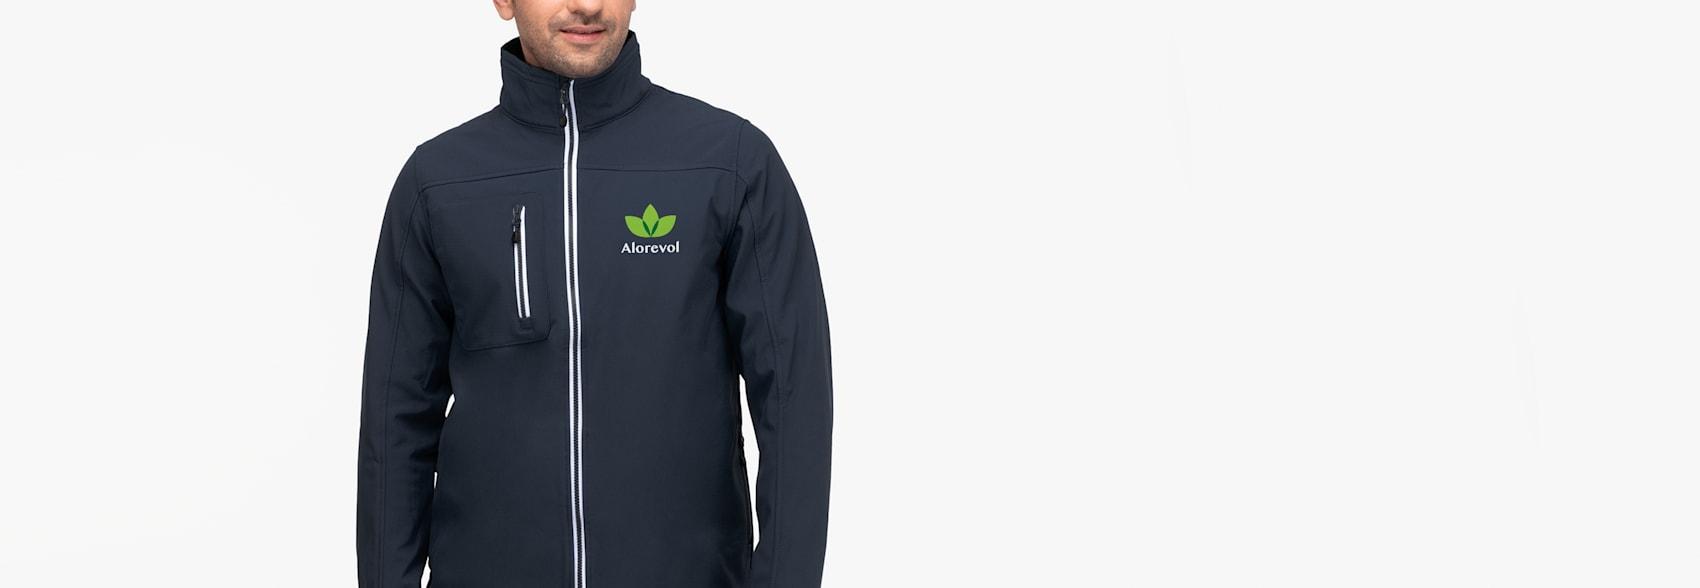 Printer Vert Softshell Jackets